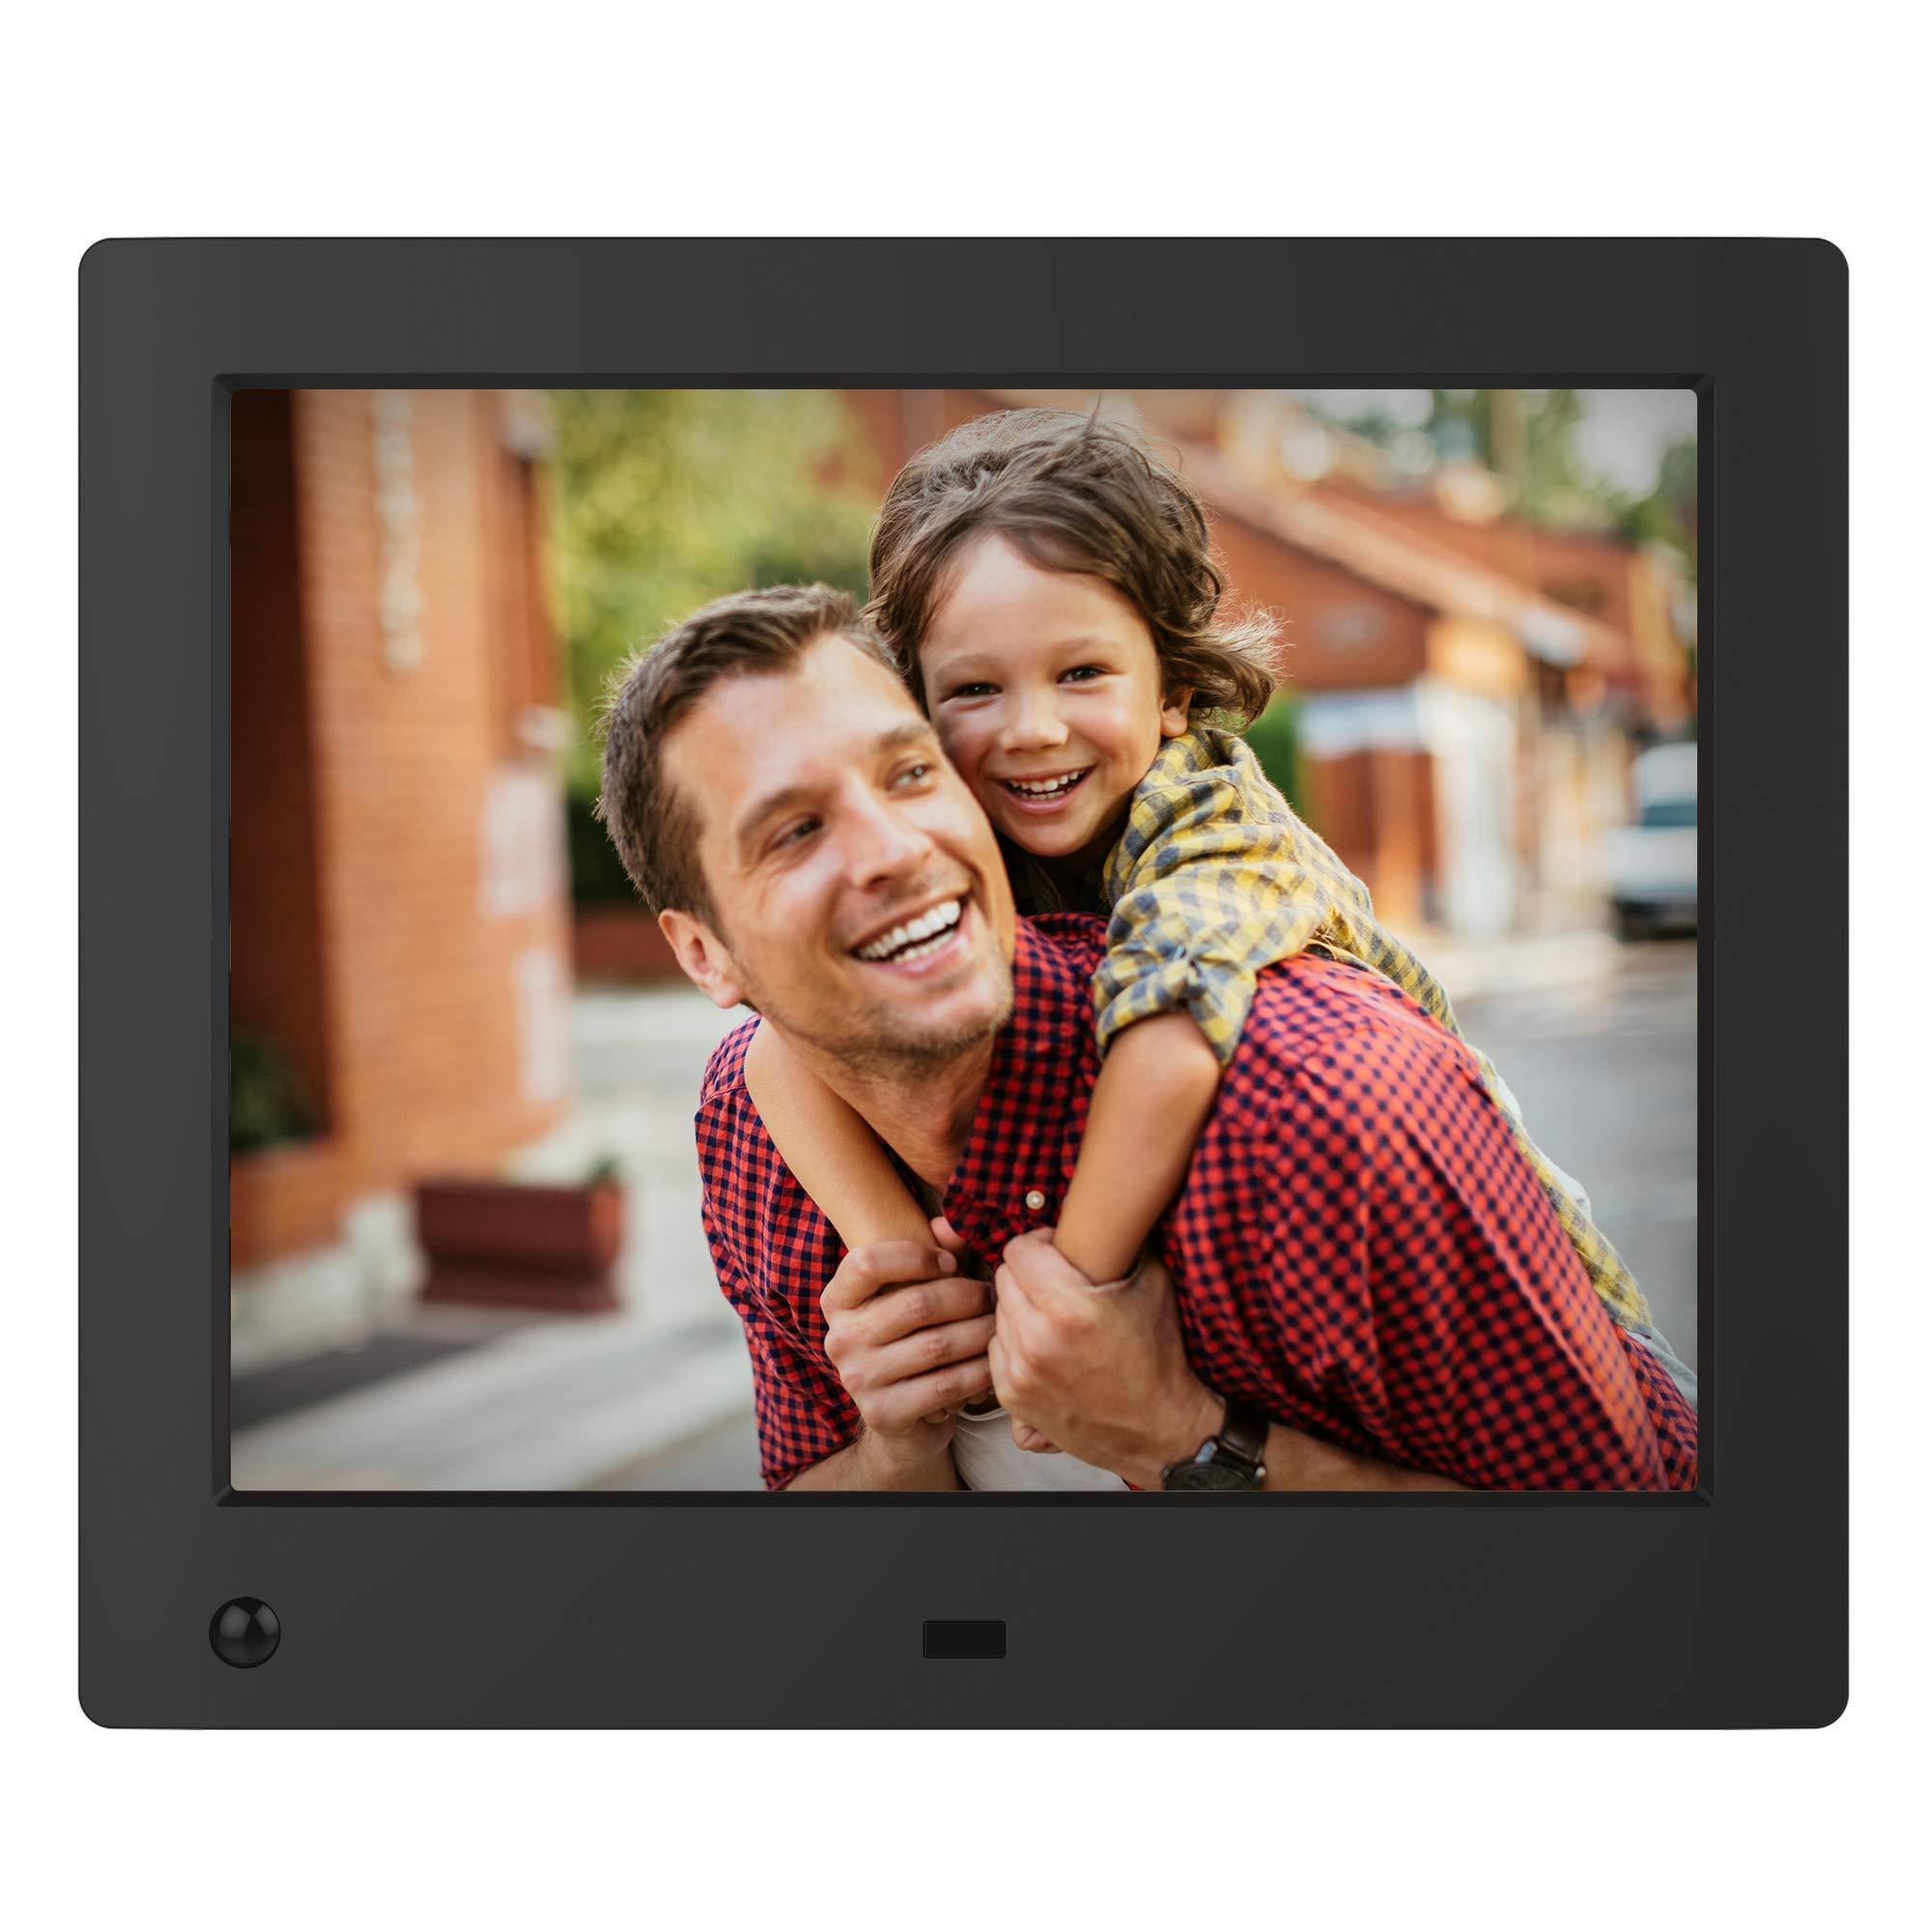 NIX Advance Digital Photo Frame 8 inch X08E. Electronic Photo Frame USB SD/SDHC